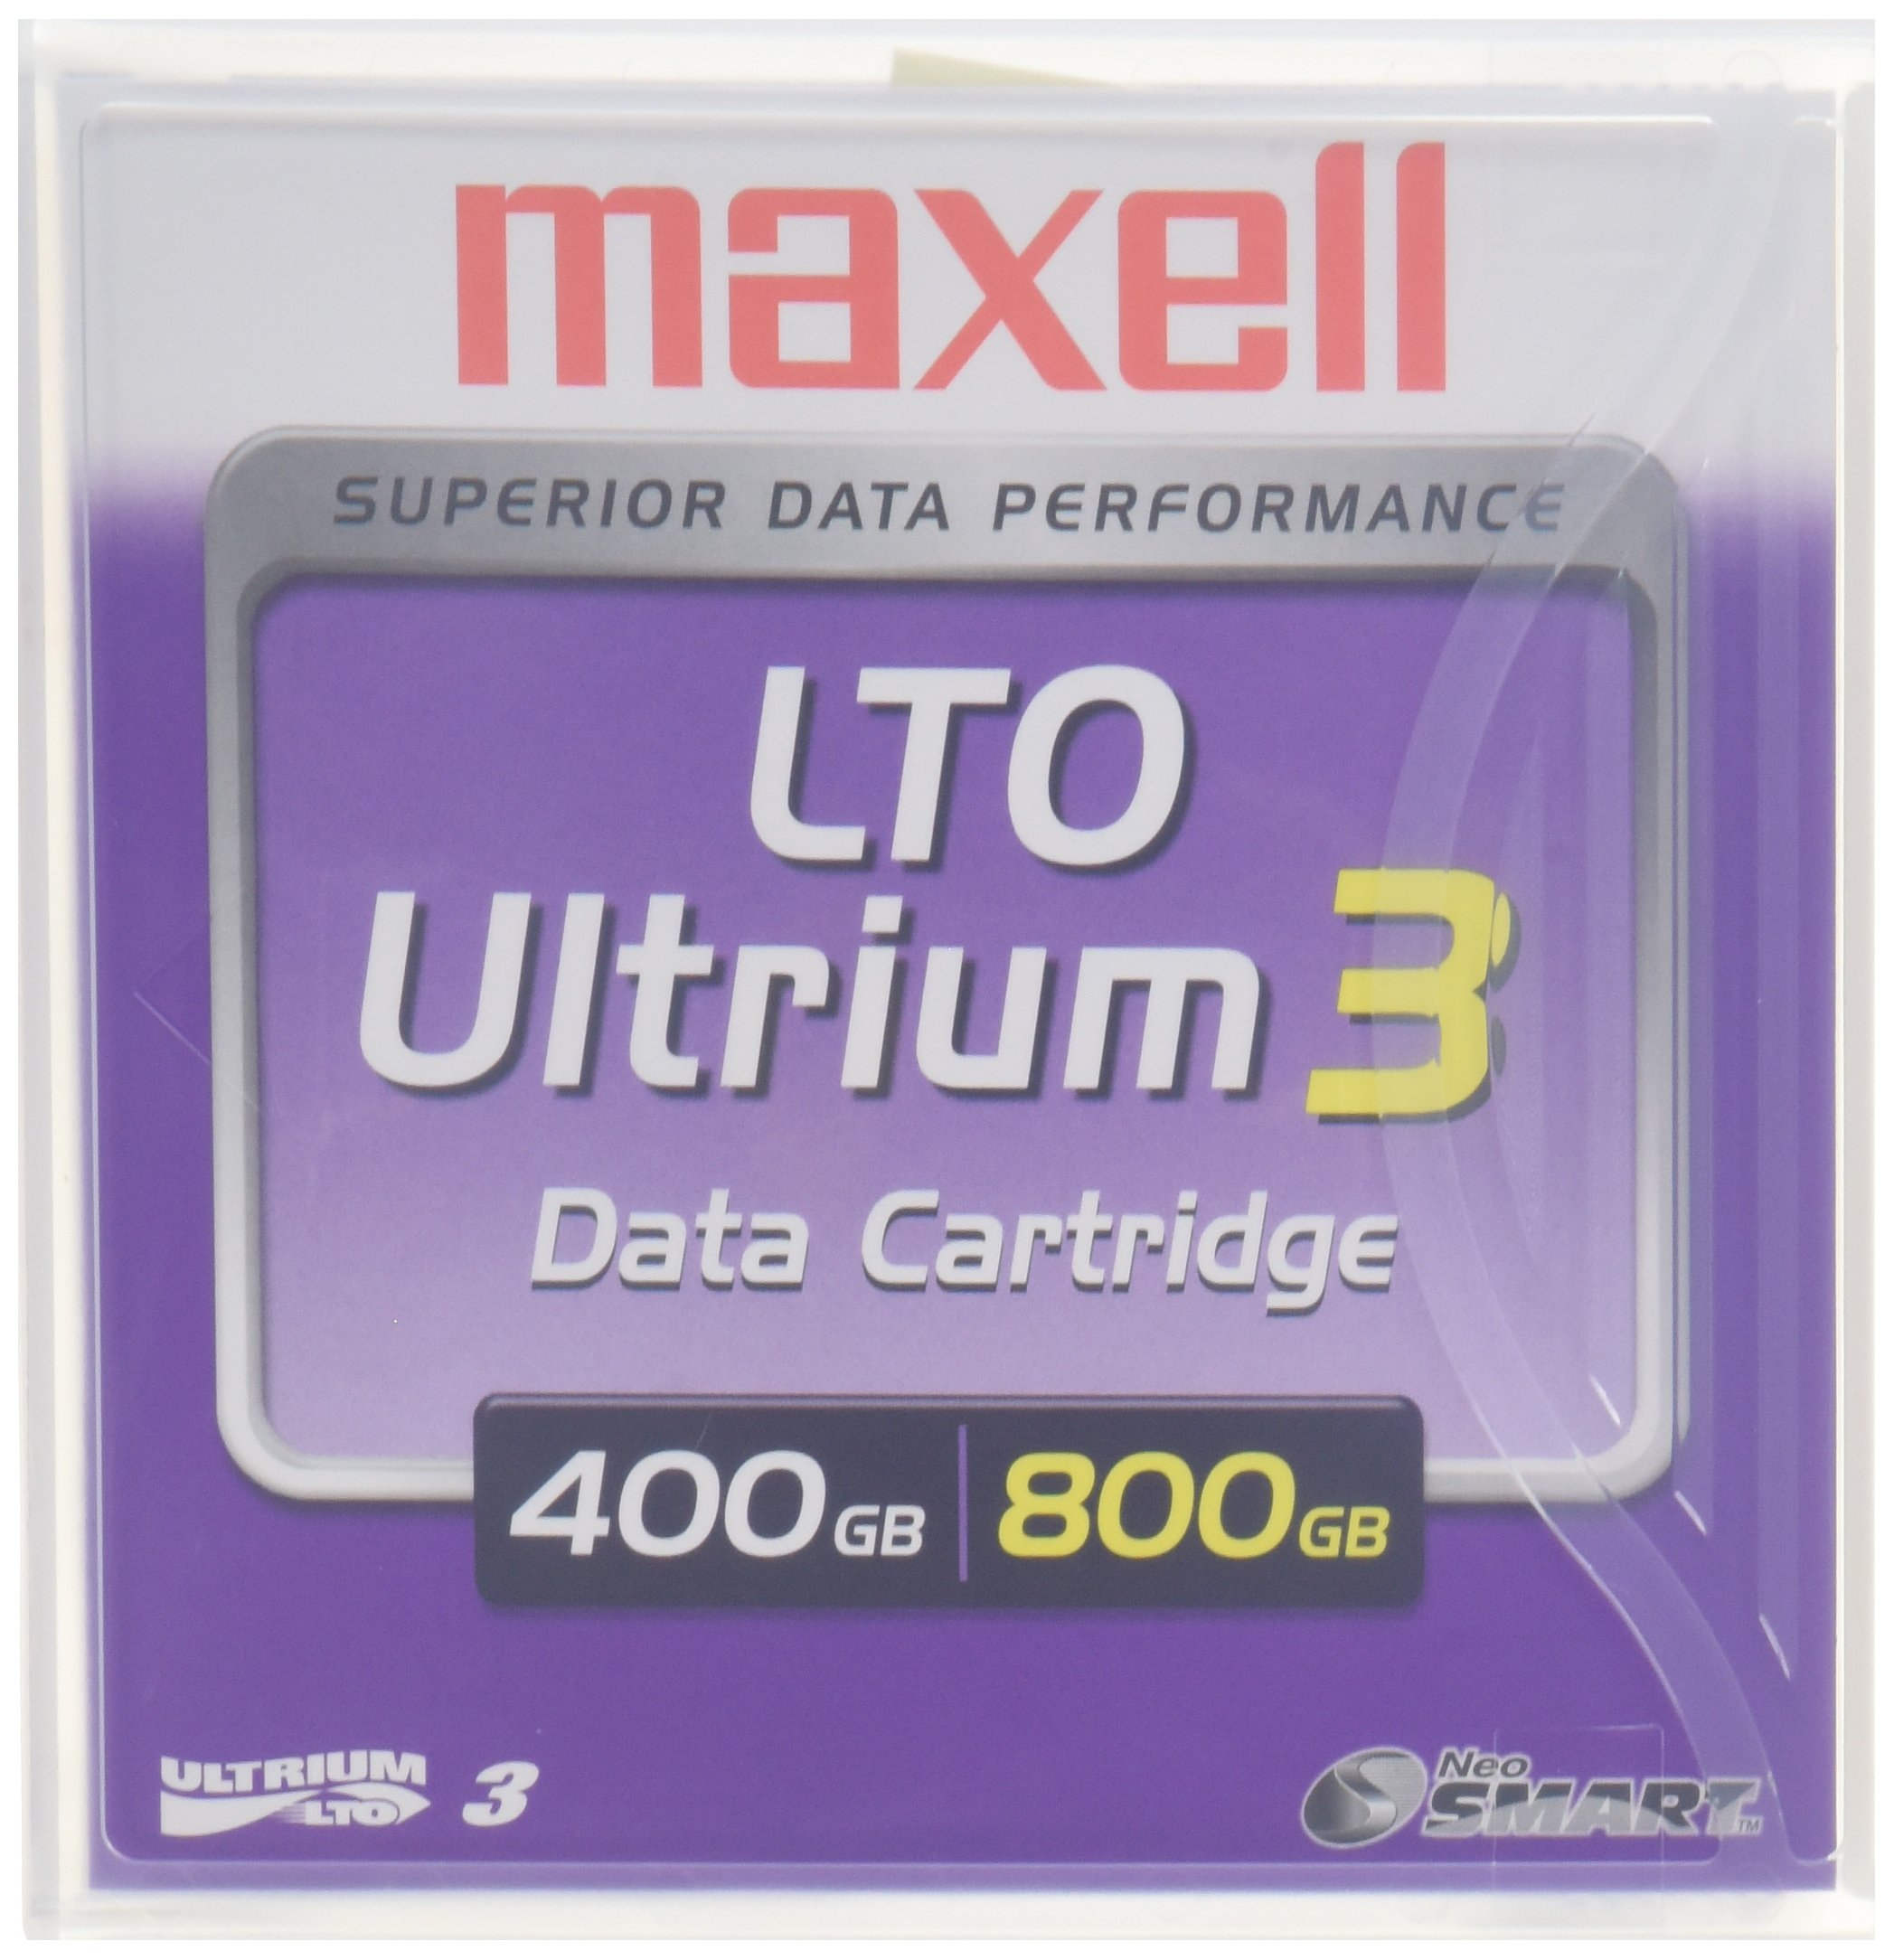 Maxell LTO Ultrium 3 400/800GB 1,000,000+ Head Passes Tape Cartridge by Maxell